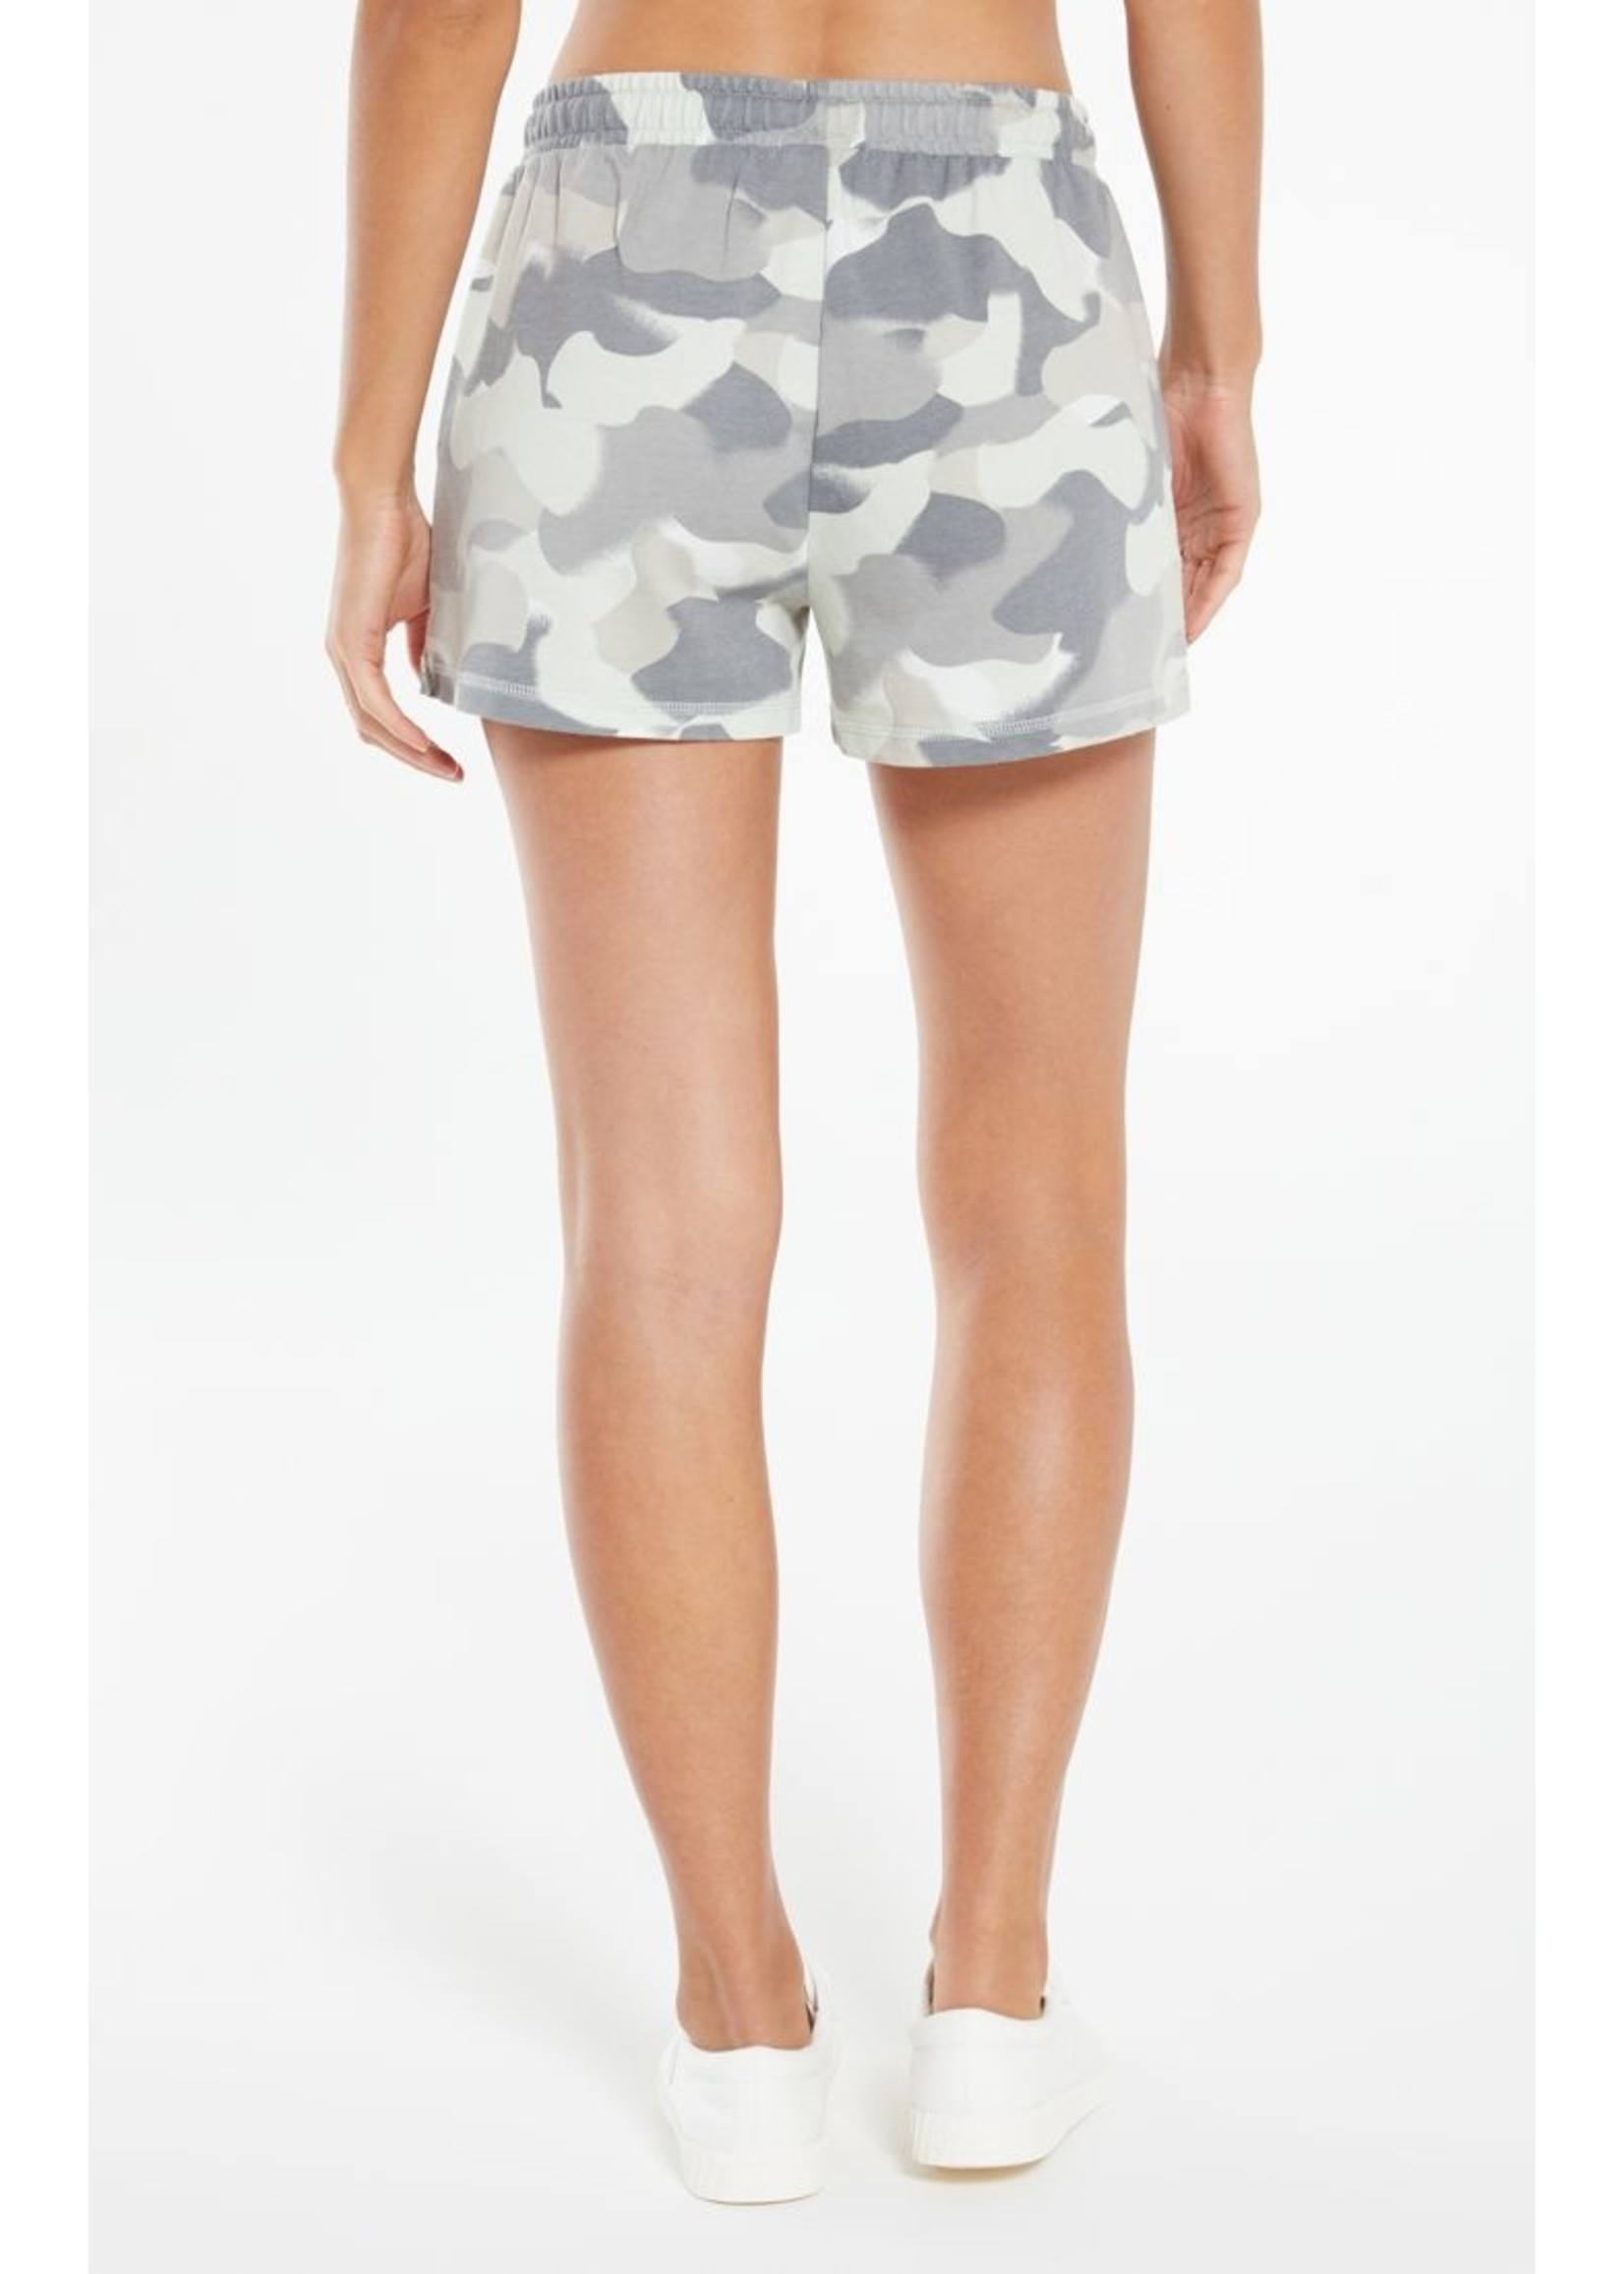 Z Supply Maris Painted Camo Shorts - ZS212537